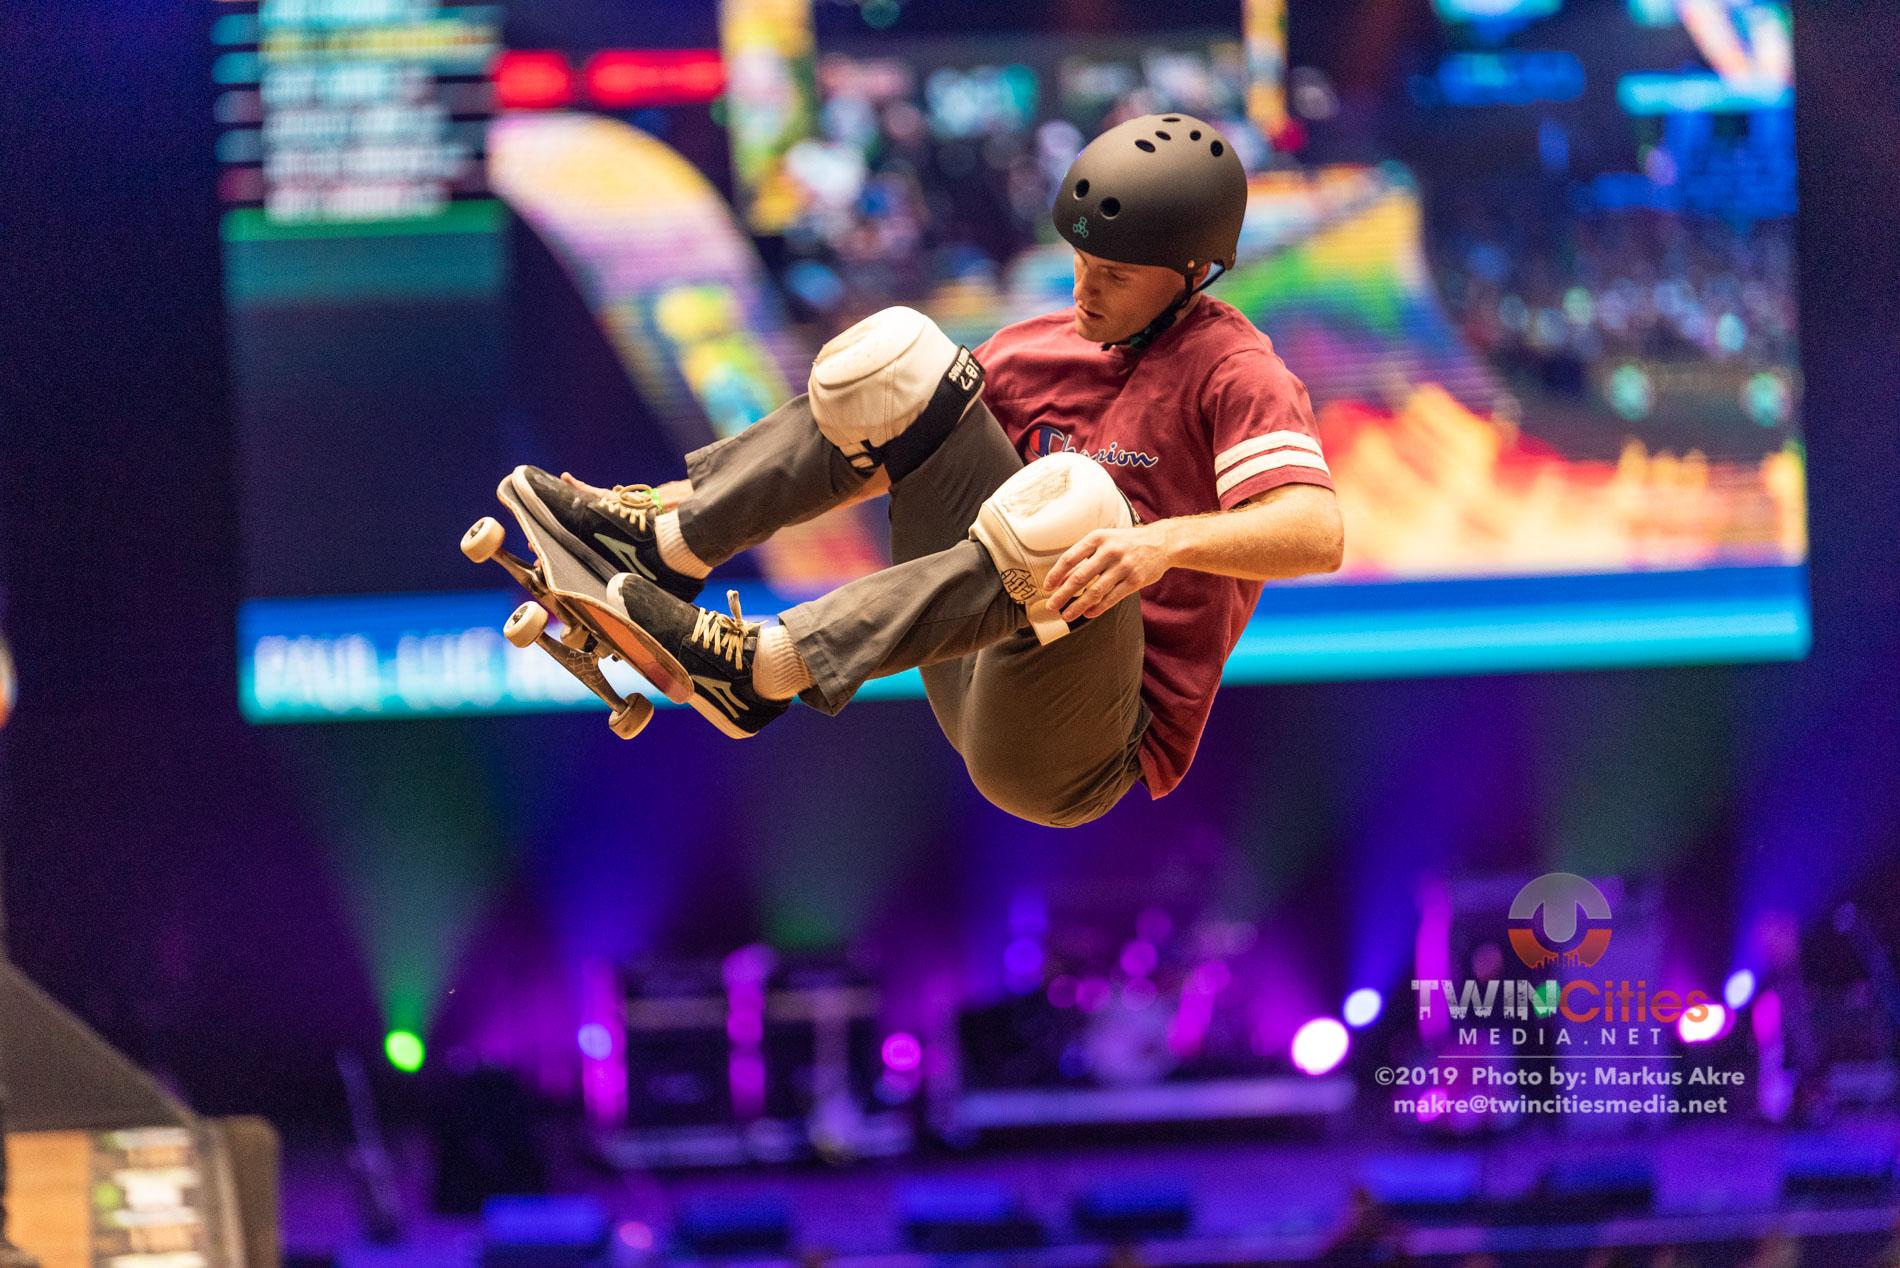 2019-X-Games-Day-1-Skateboard-Vert-6